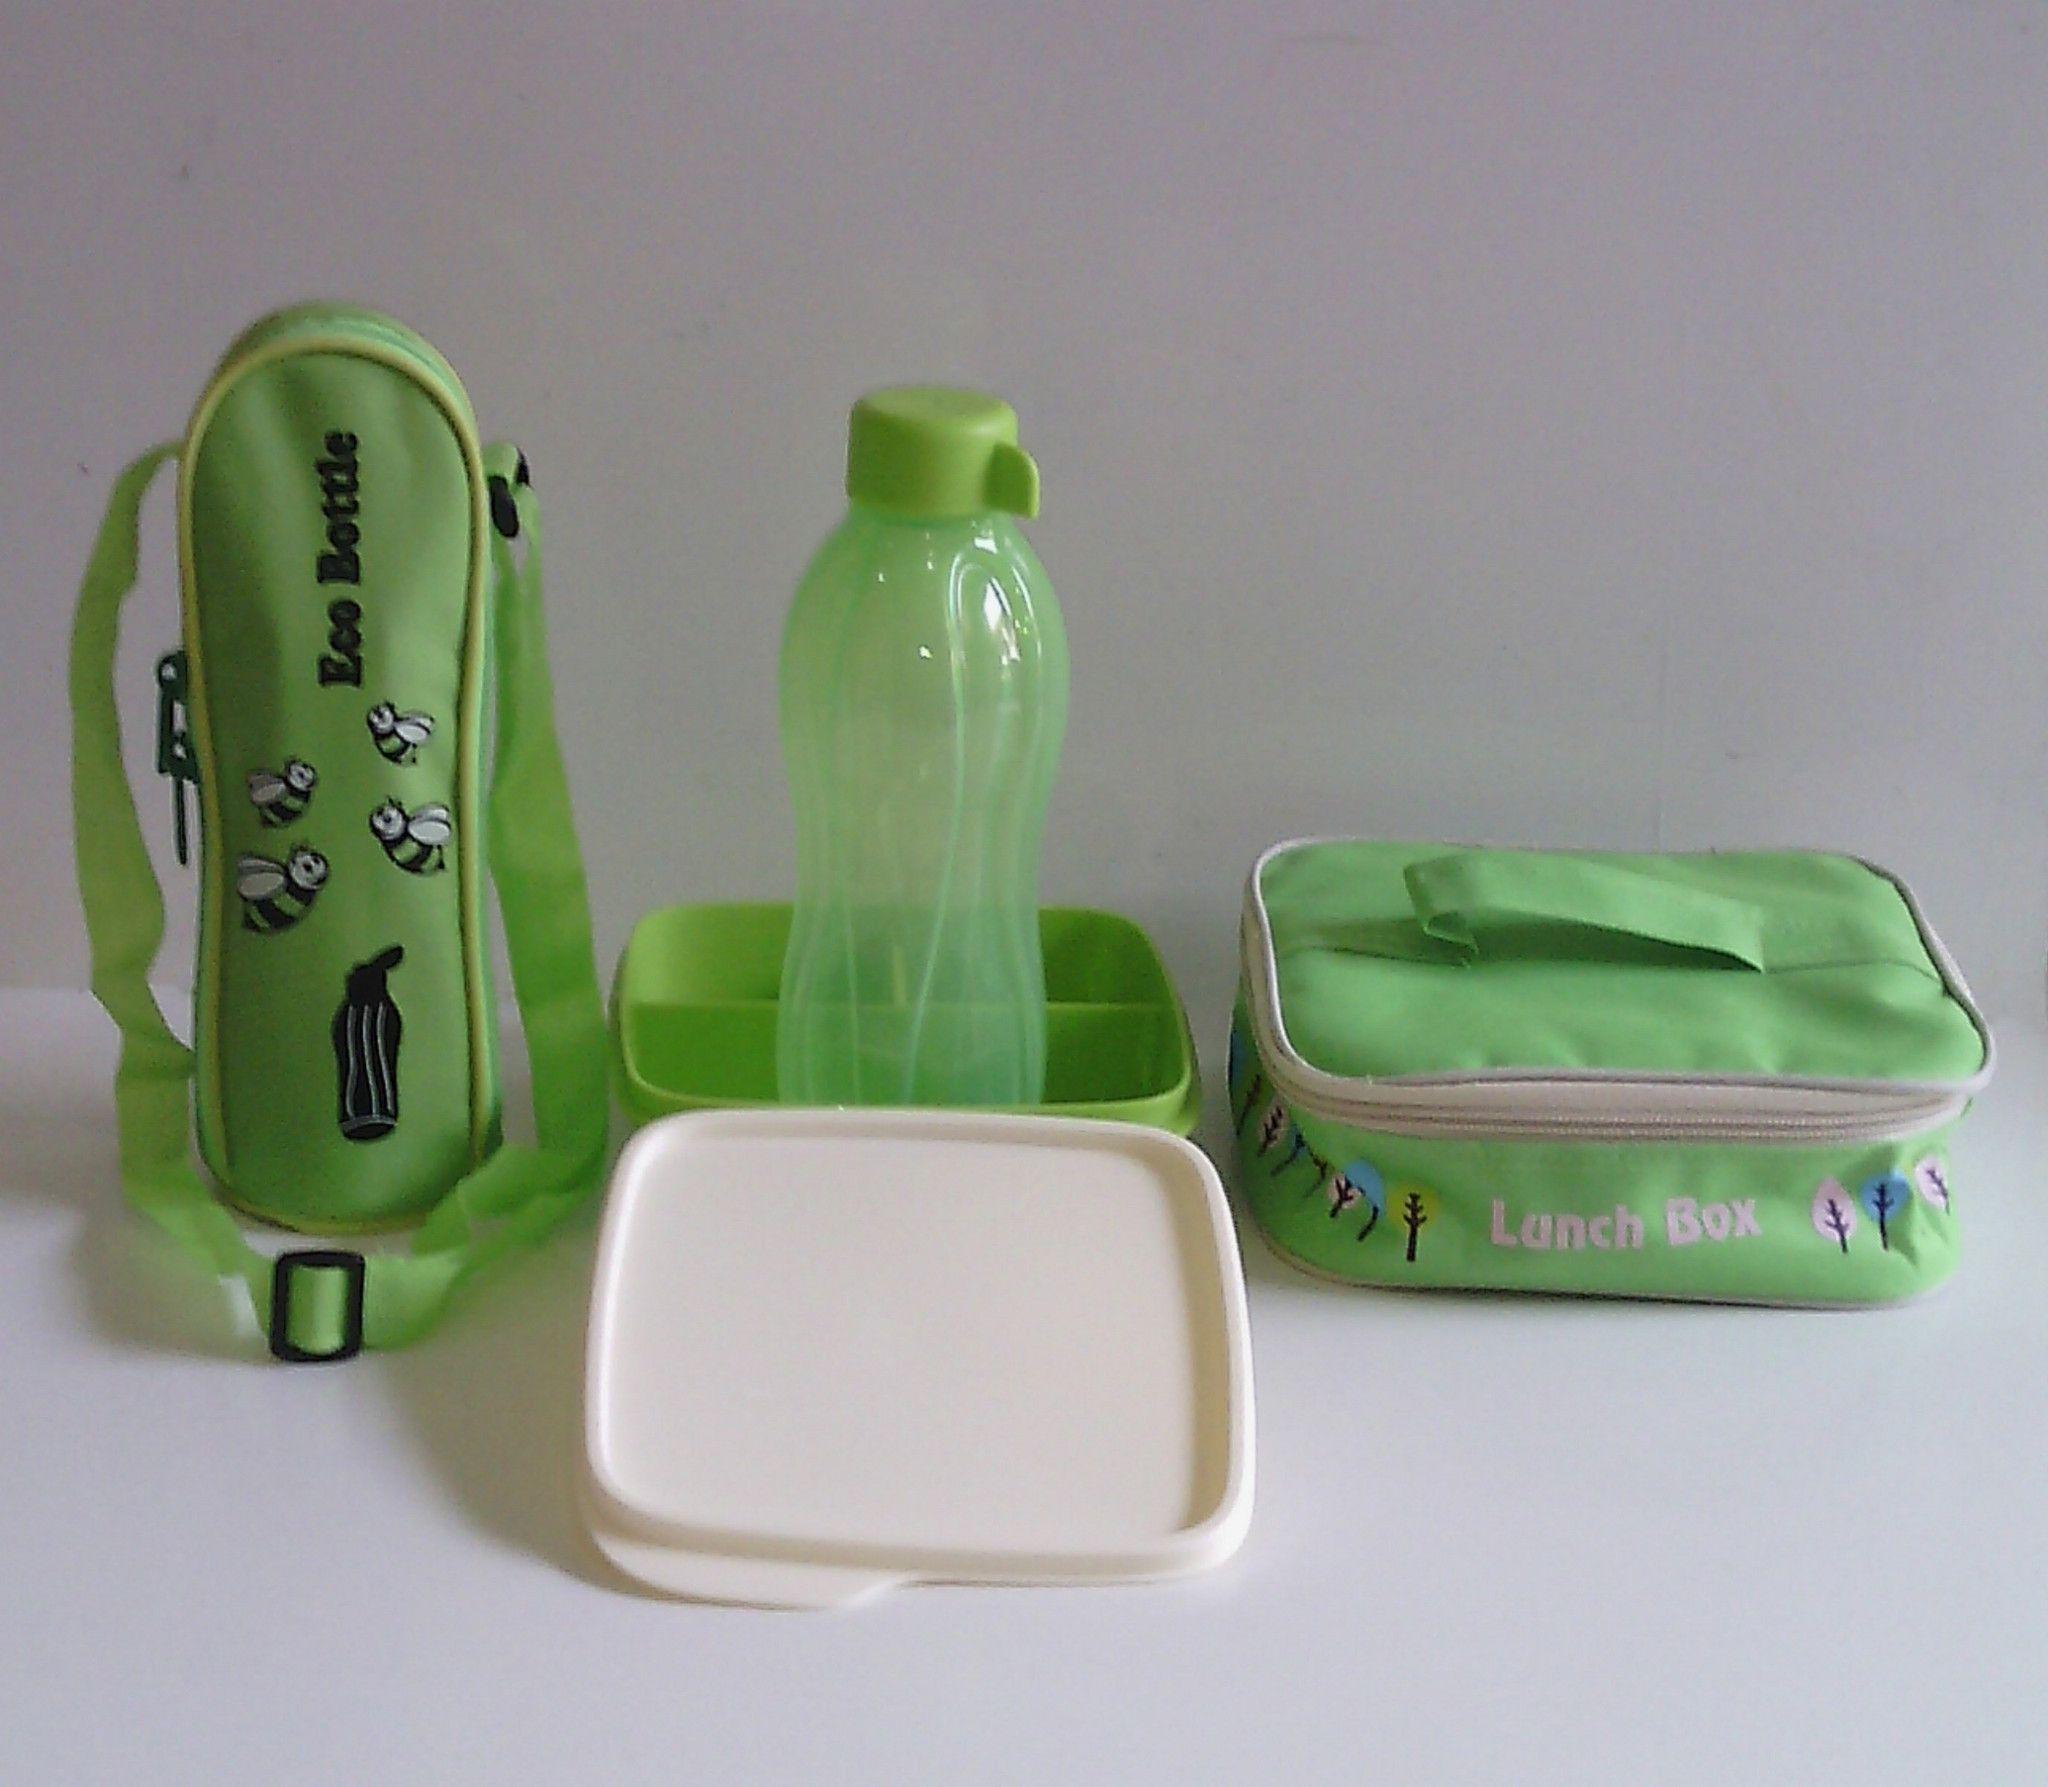 Jual Paket Hijau Tupperware Lolly Tup Eco Bottle 500ml Dan Tas  Bb 1 Plus Tuppy Lovers